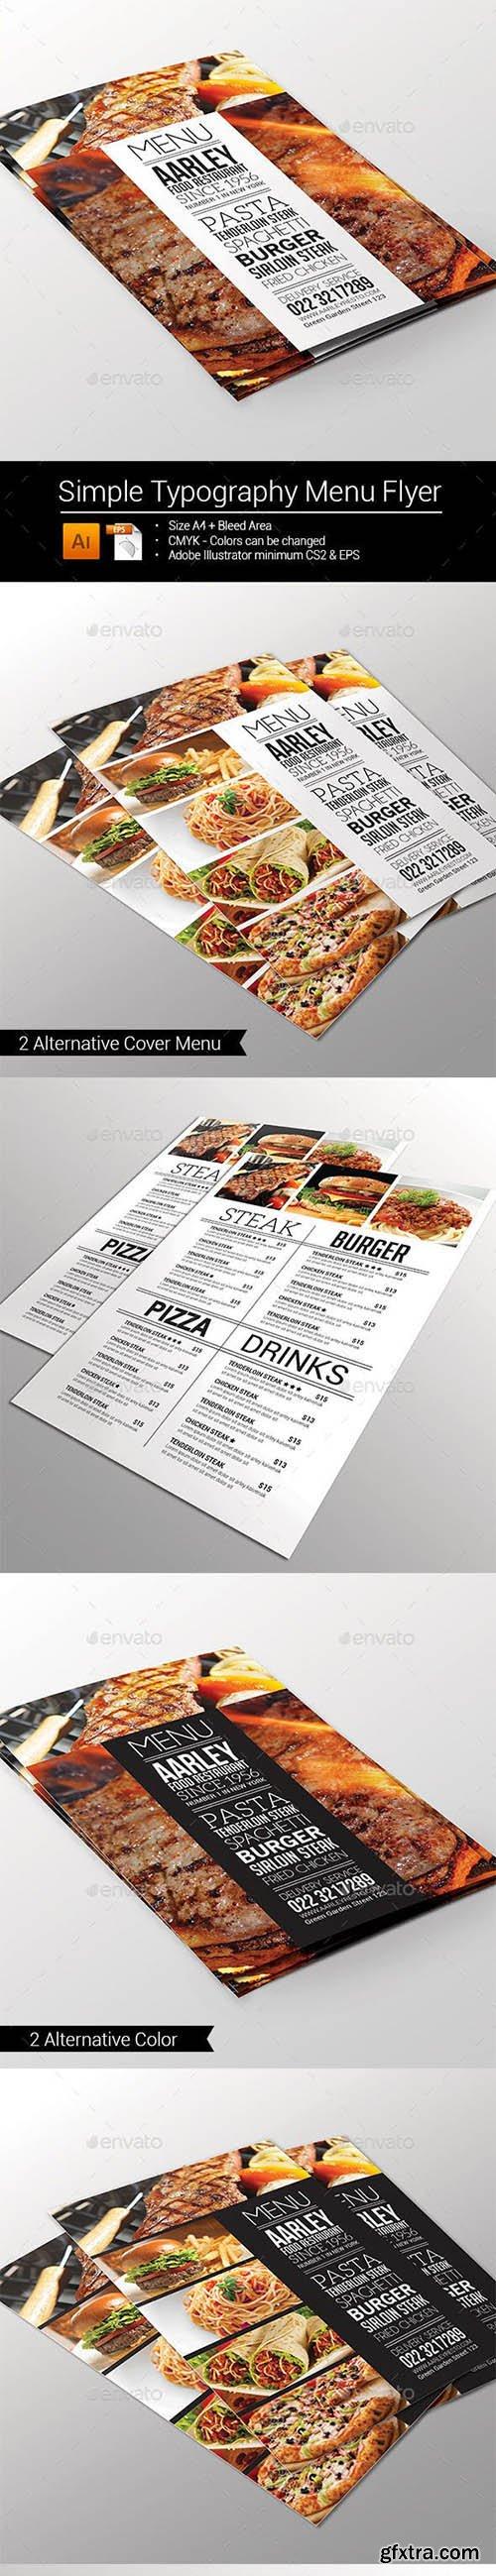 Simple Typography Menu Flyer 10013533